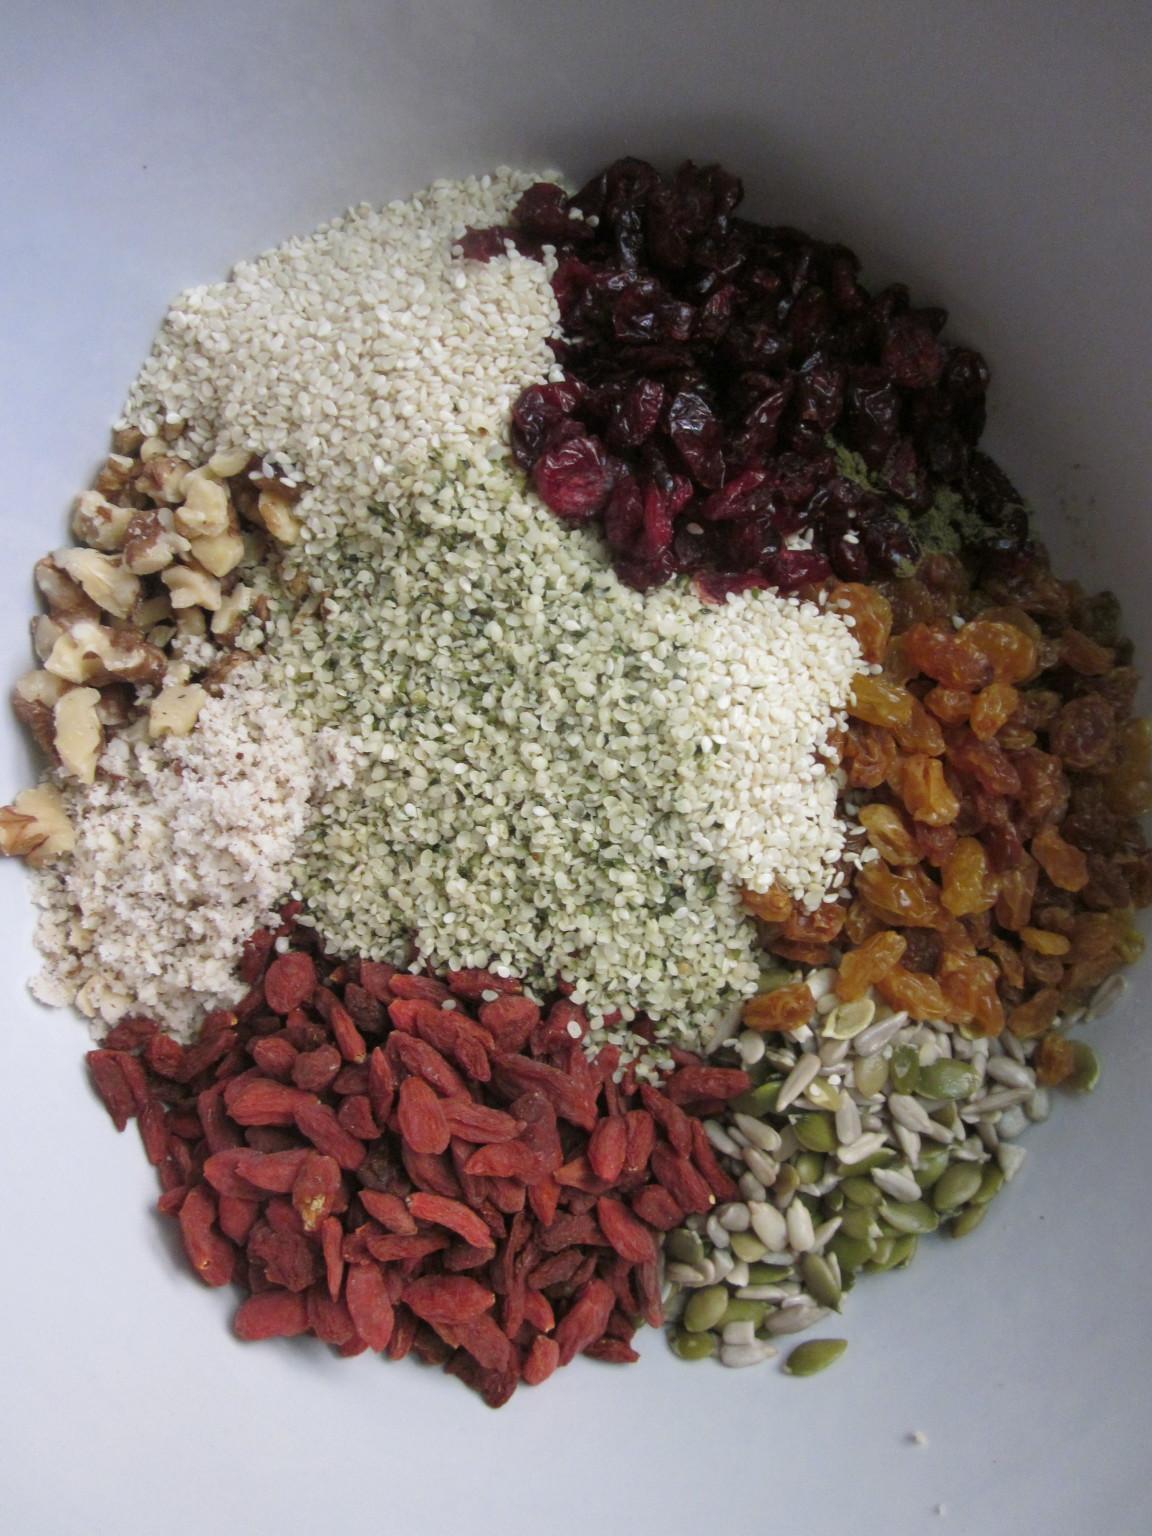 Hemp Protein Fruit Nut And Seed Bar Reciperobins Key